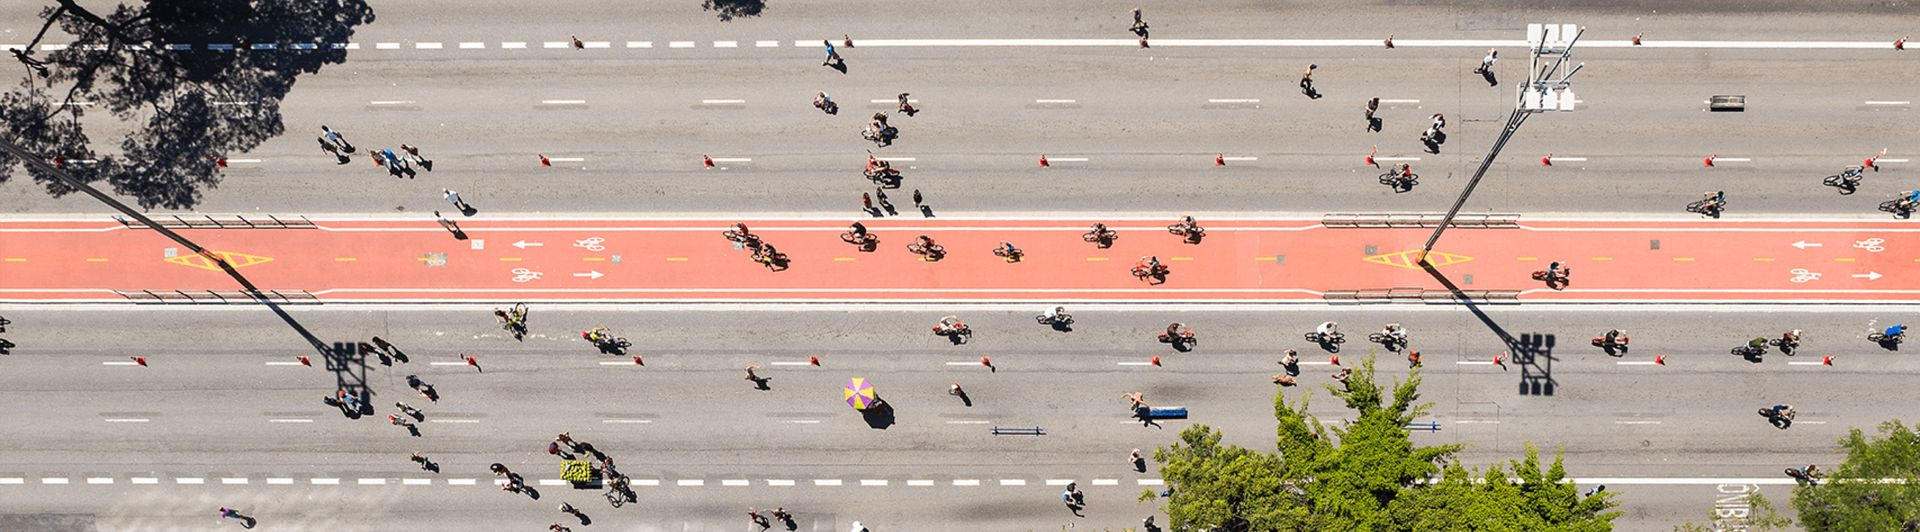 Big street full of cyclists